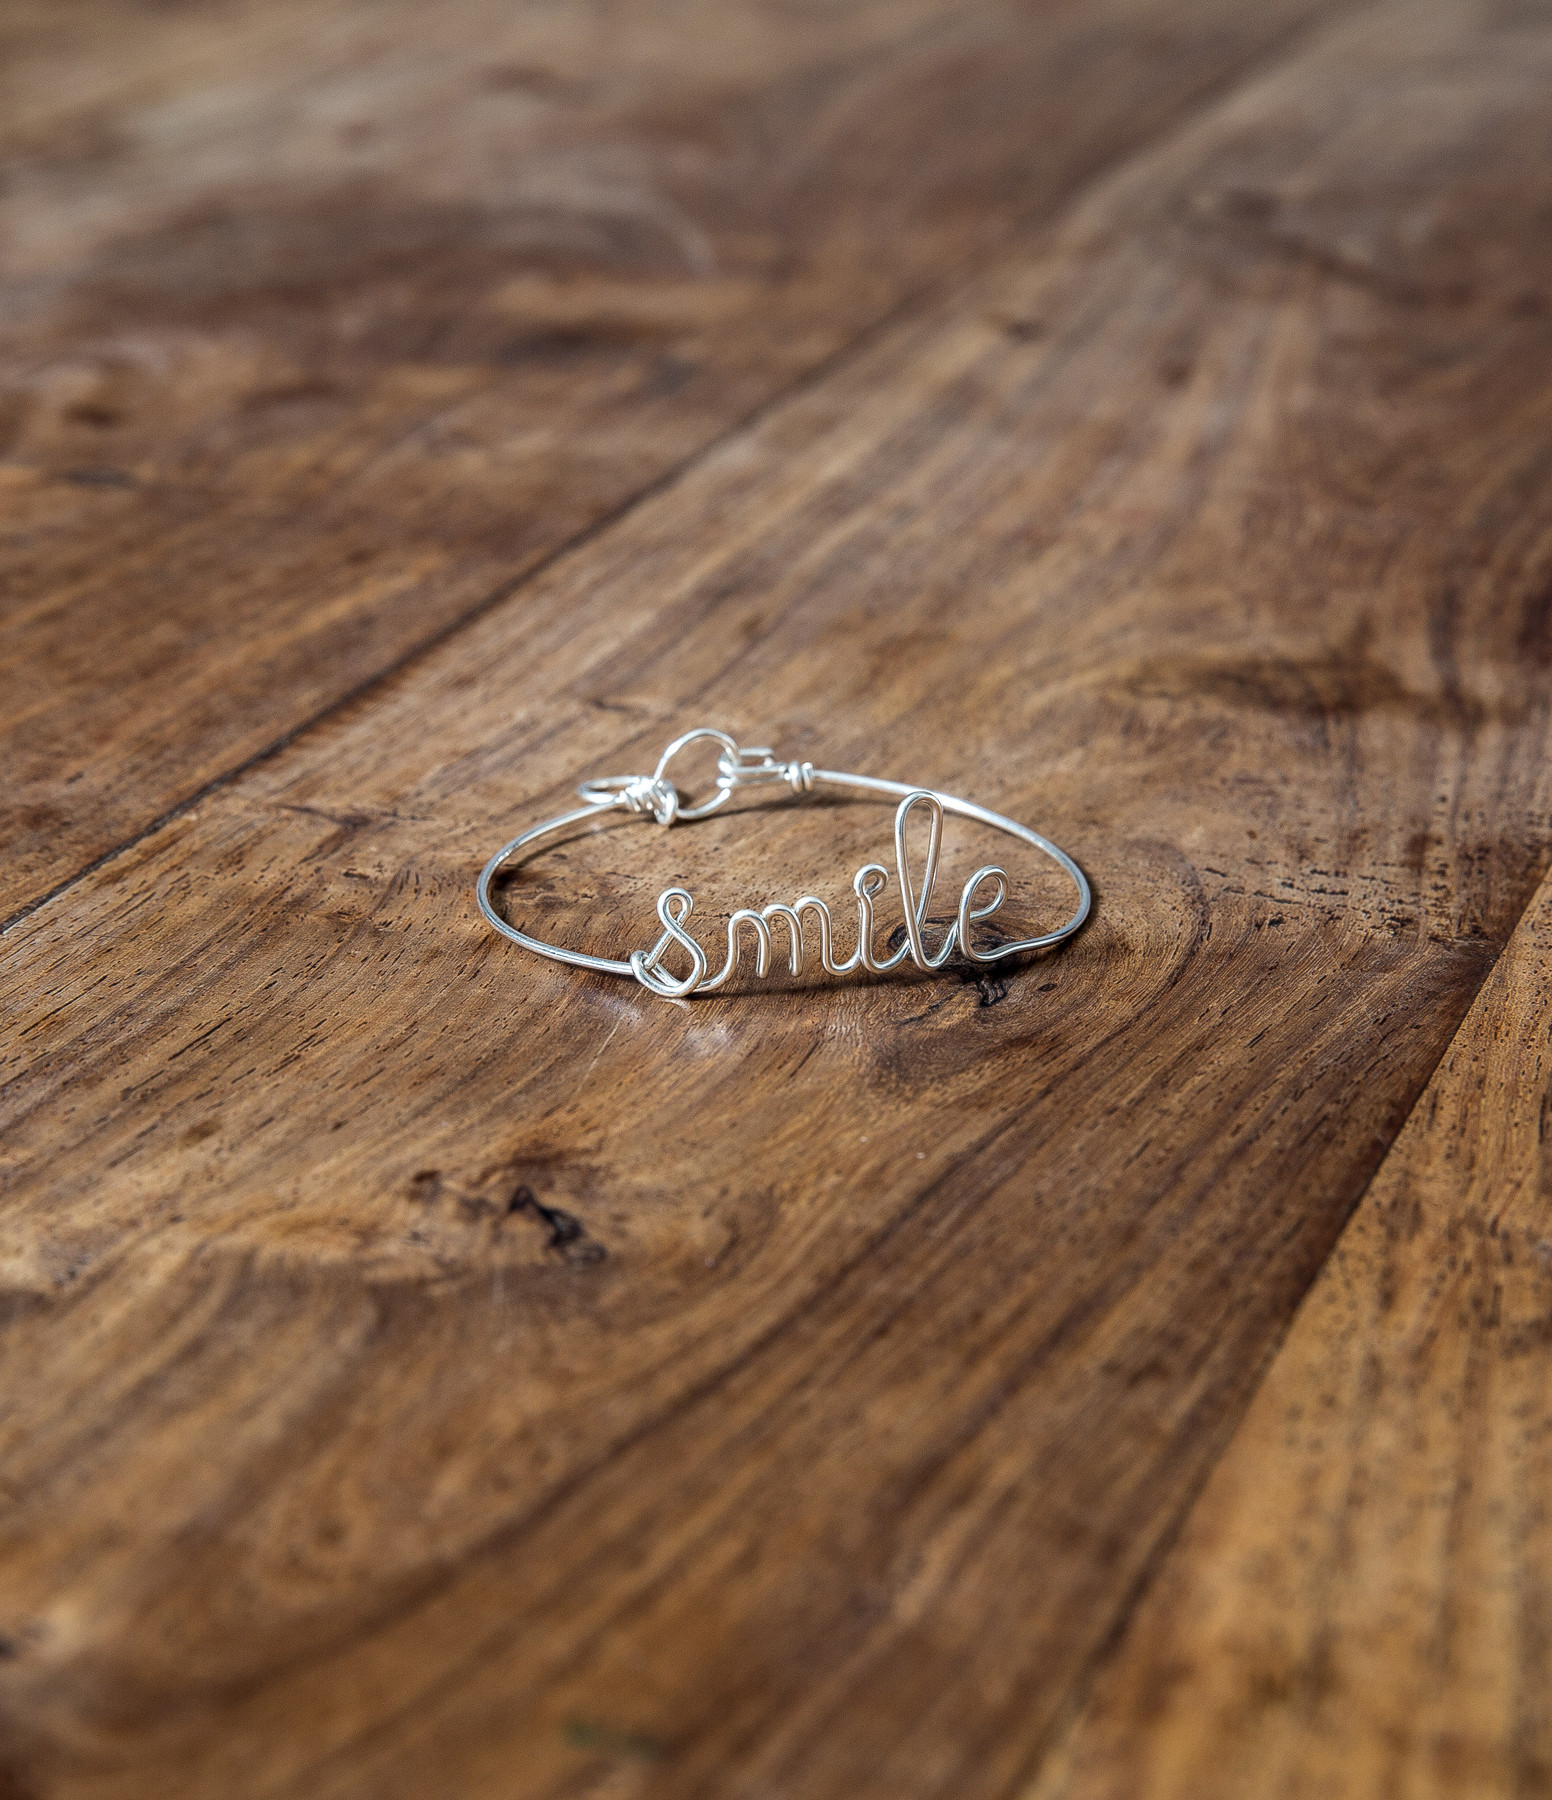 Bracelet Fil Exclu Lulli Jadore Argent - ATELIER PAULIN